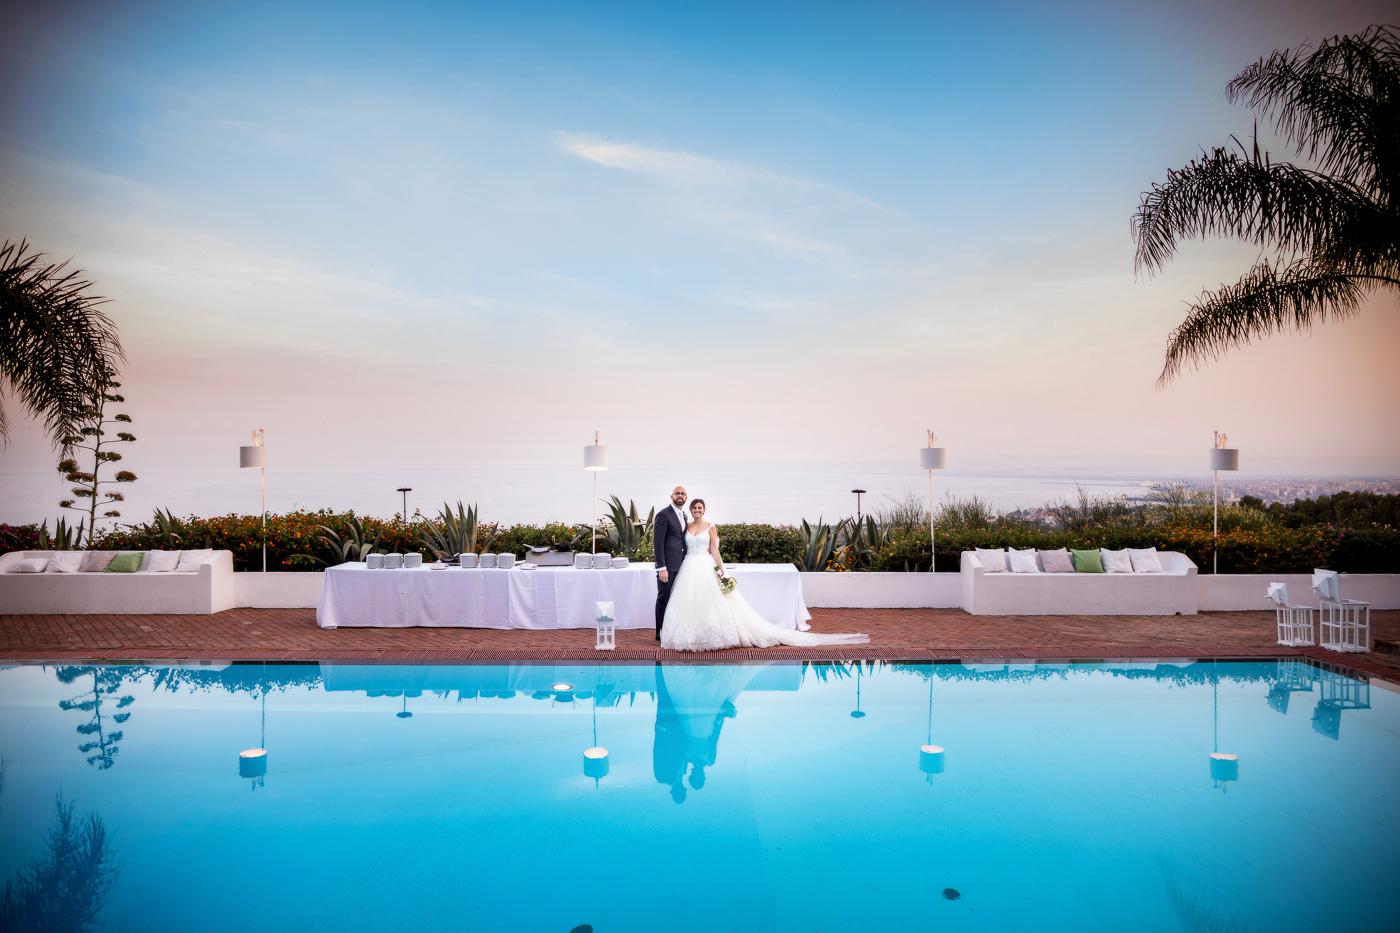 Casa delle Terre Forti Wedding Day _wedding_photographer_sicily_taormina_top_best_videographer-church-sangiuliano-catania-best-top-photos-swimingpool-sunset